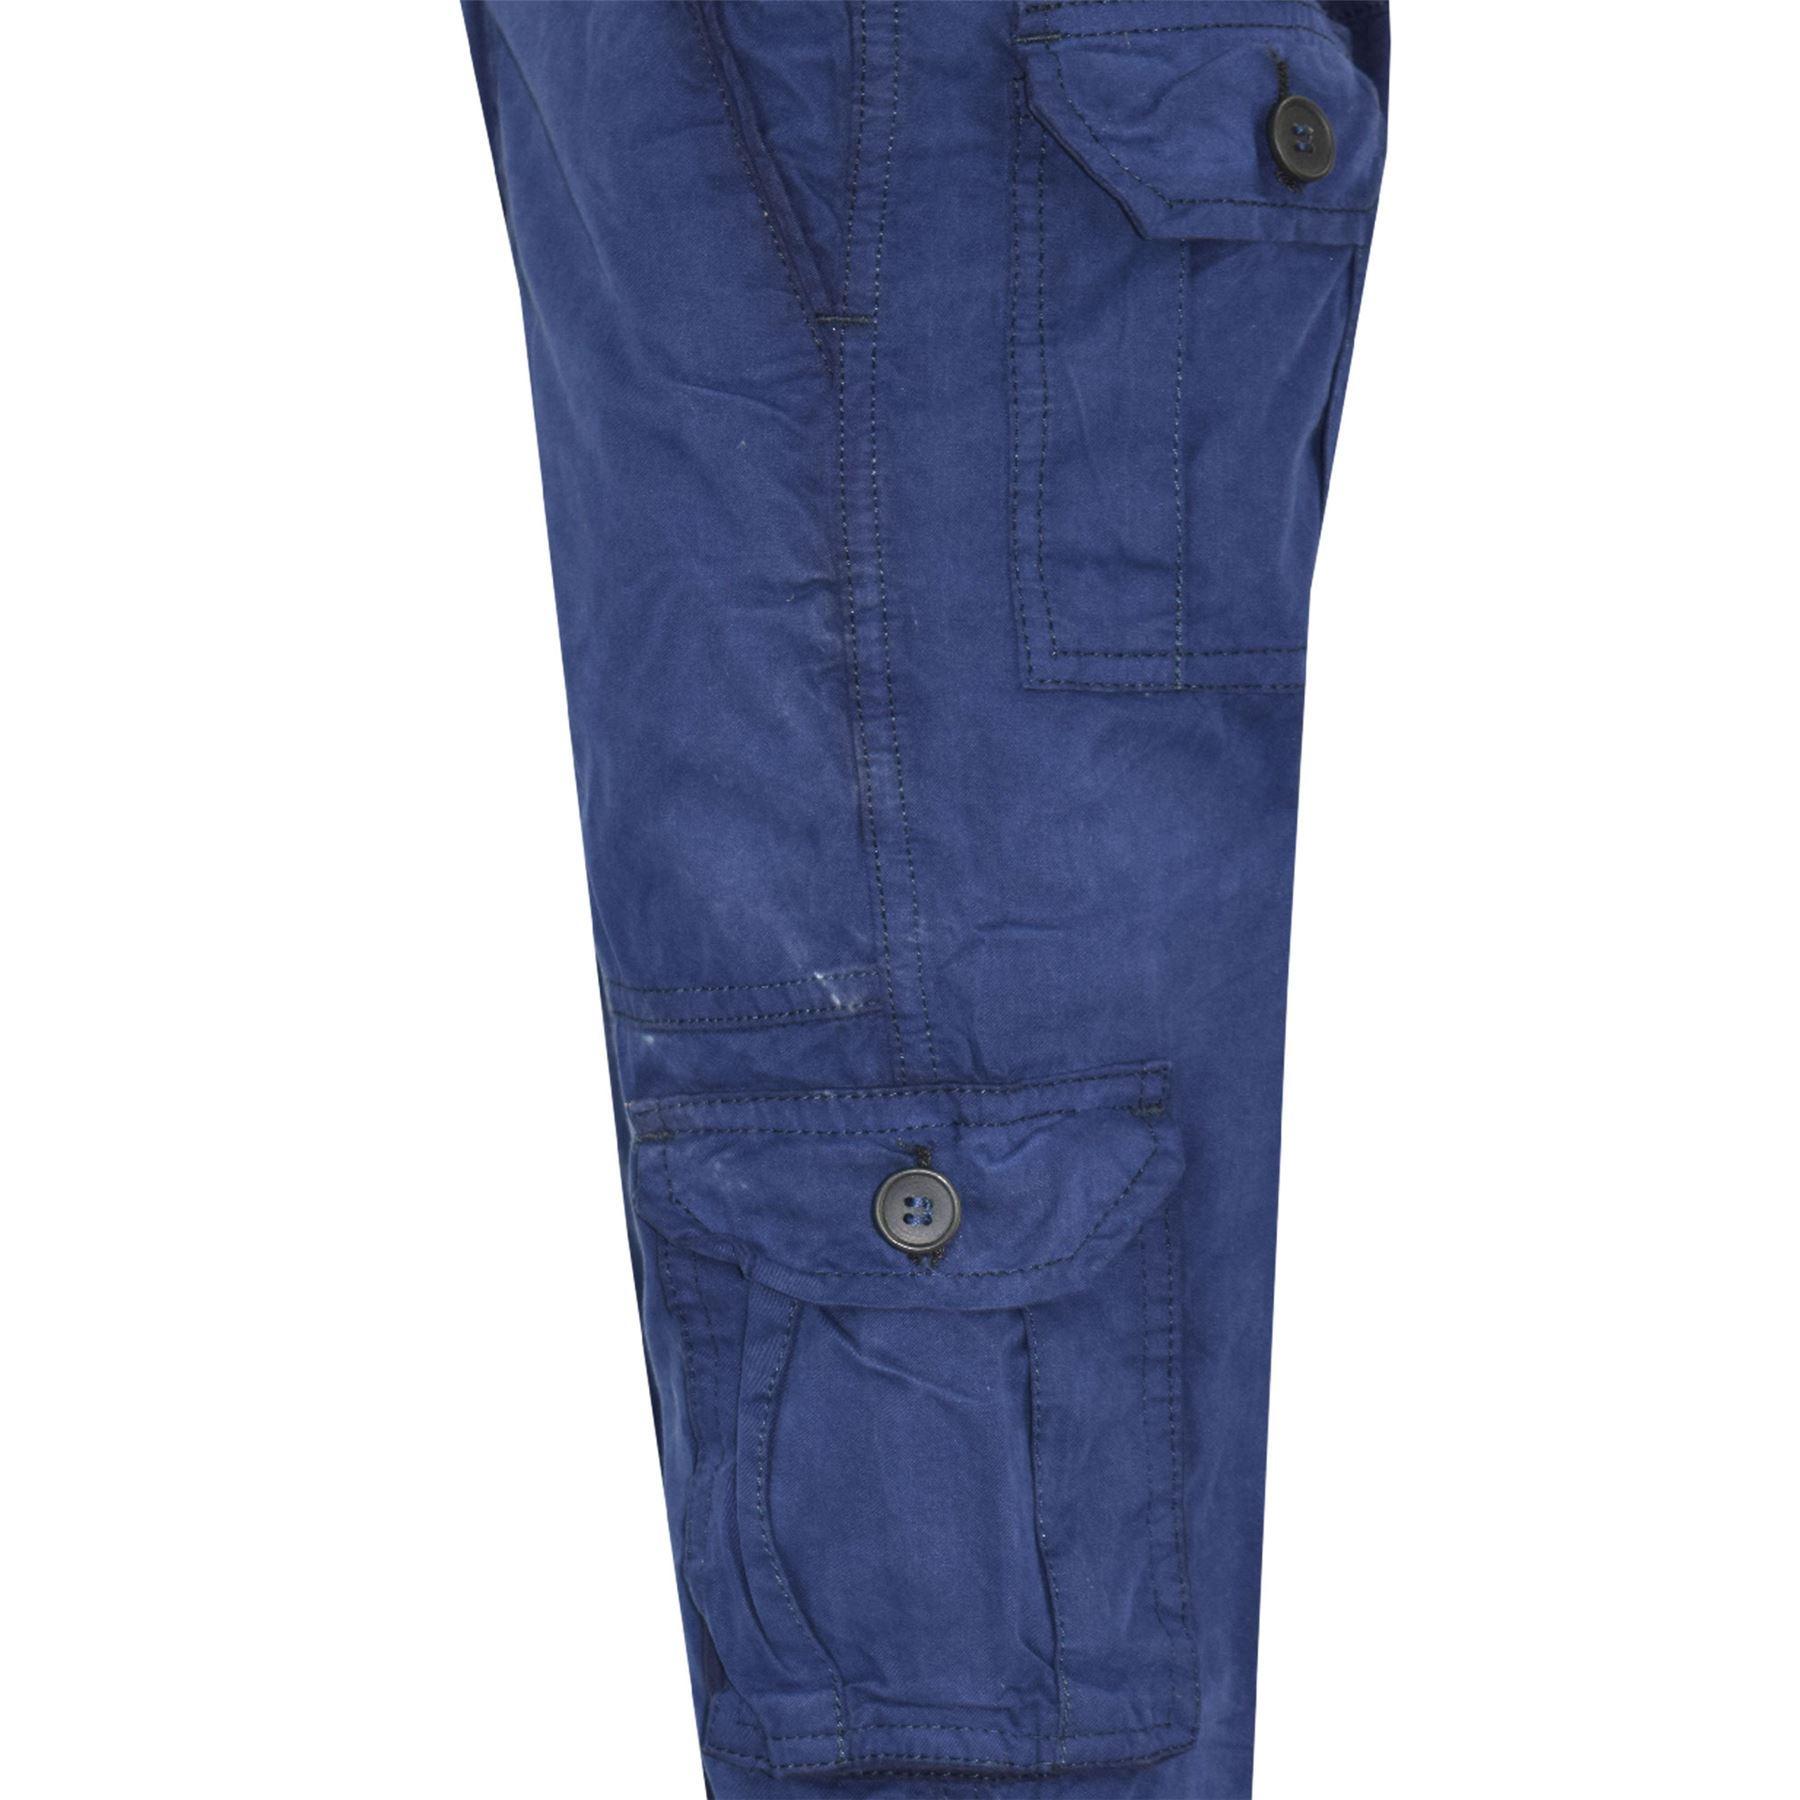 Bambini Ragazzi Giovanile BDU Ranger 6-Tasca Pantaloni Cargo Combat Blu Scuro Moda Pantalone 5-13